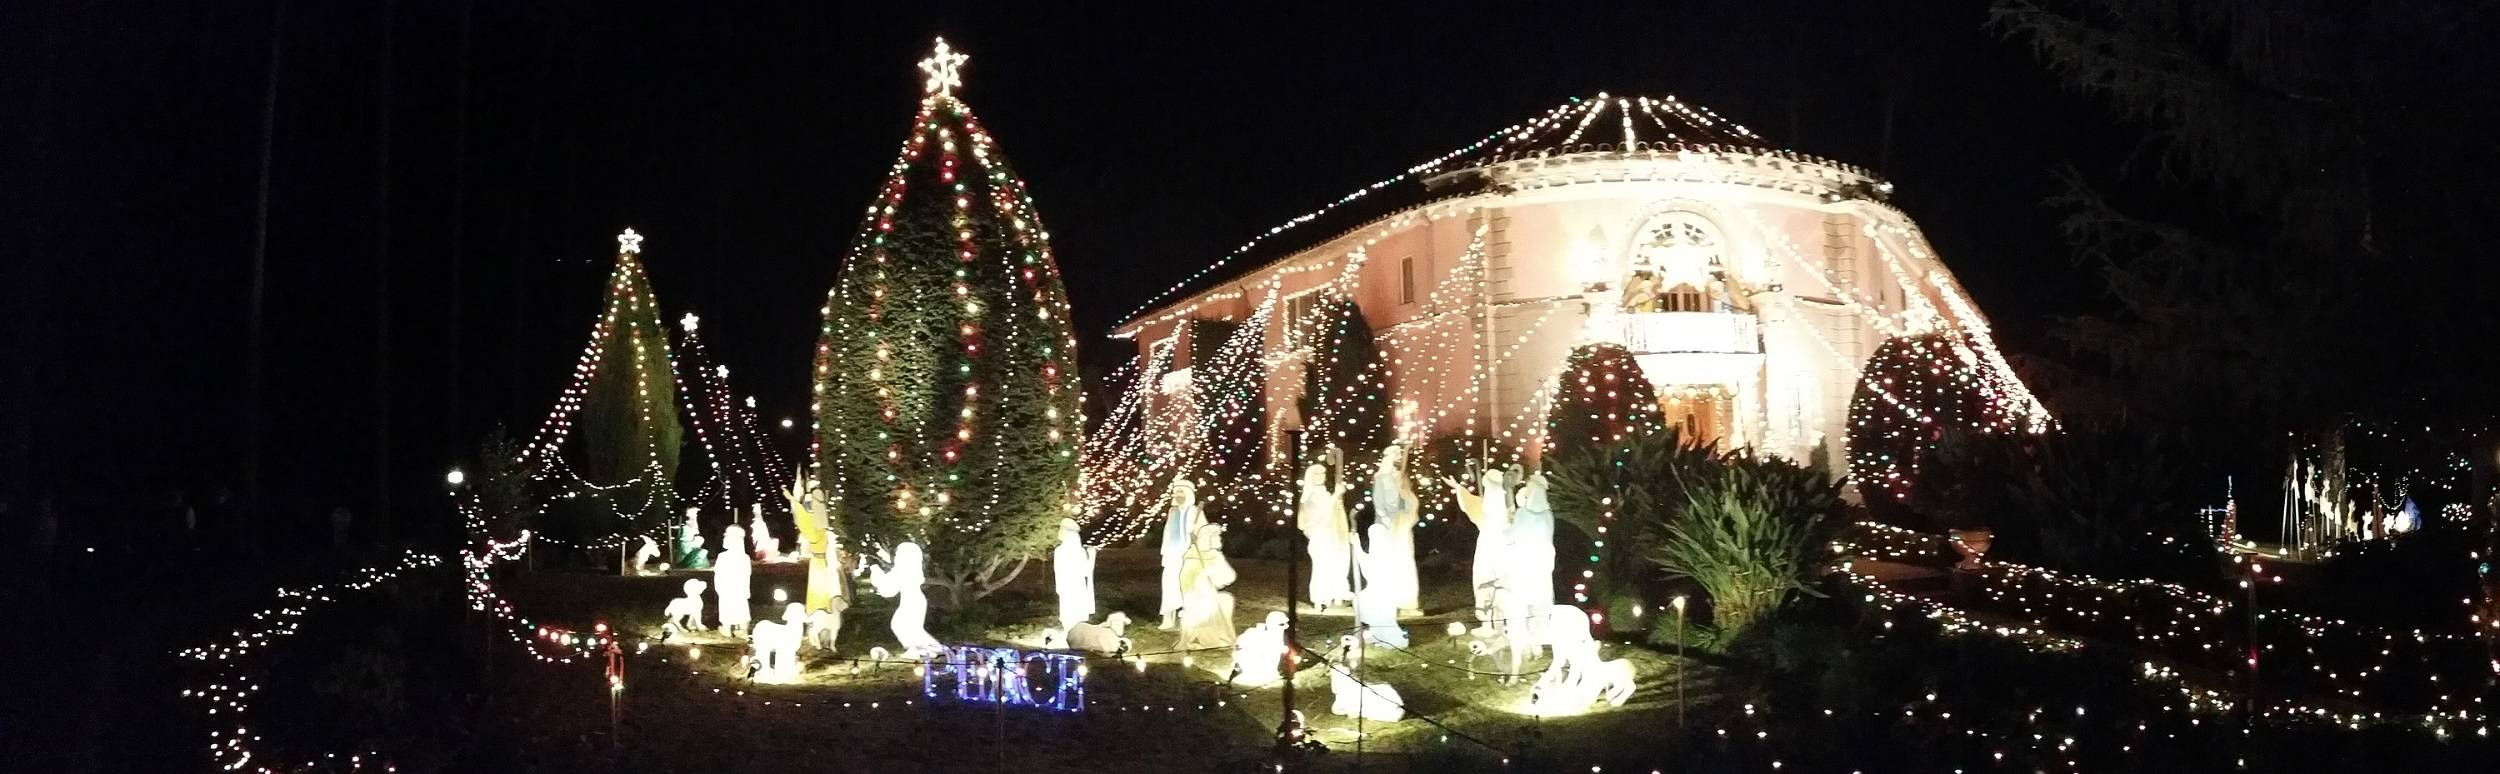 balian house altadena at christmas